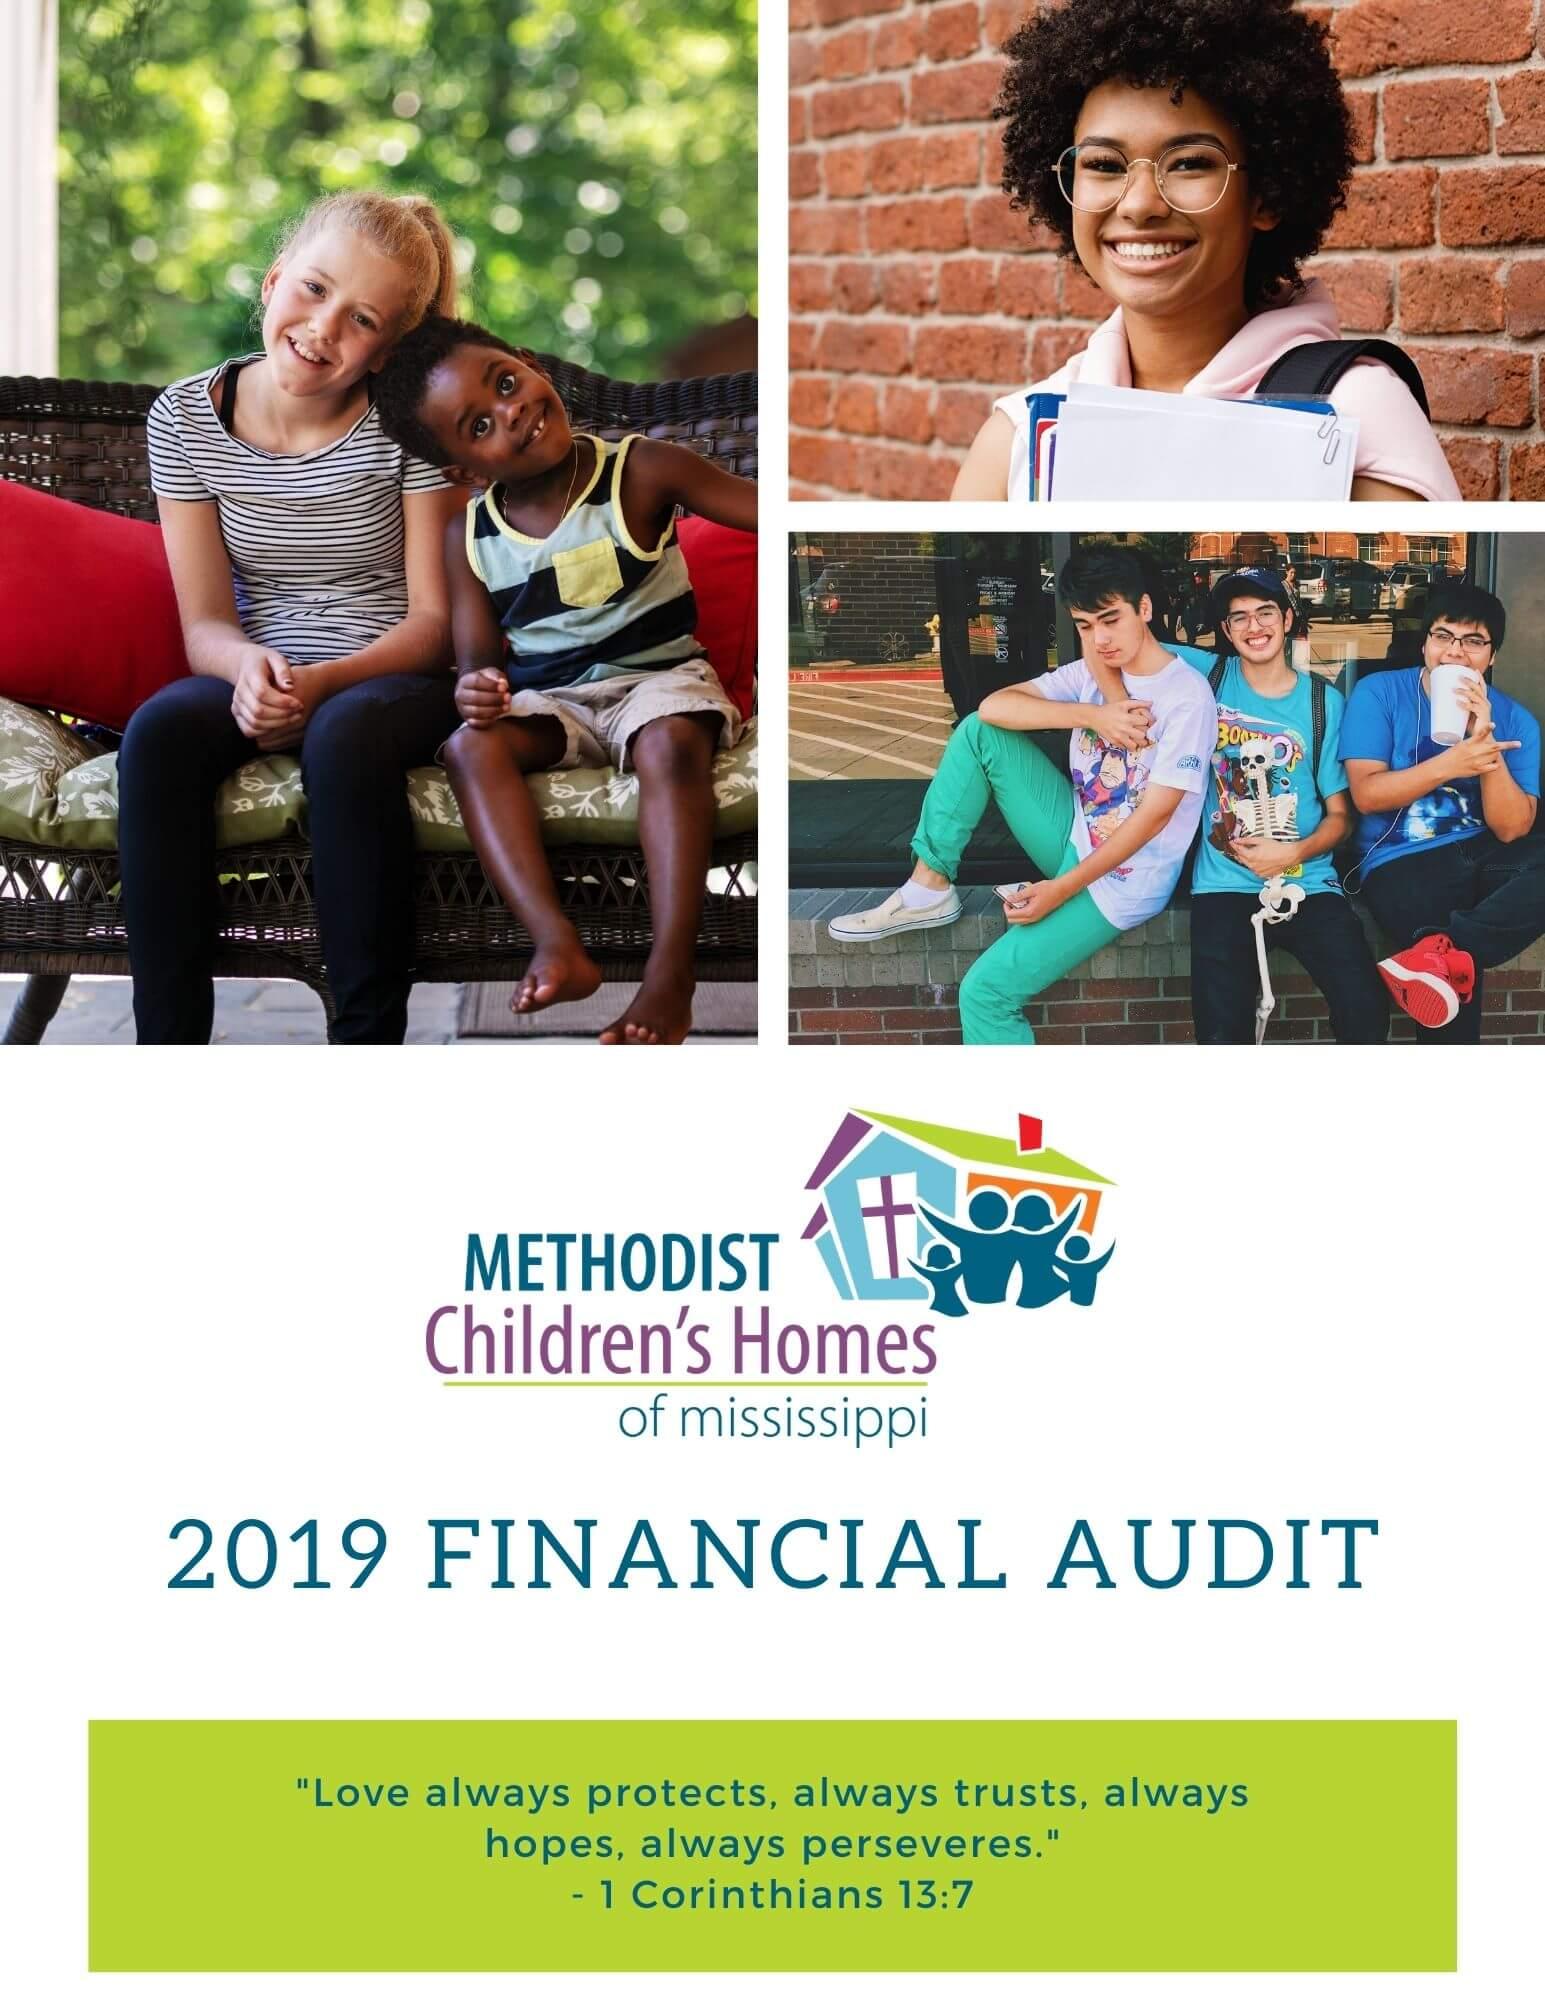 990 financial audit images